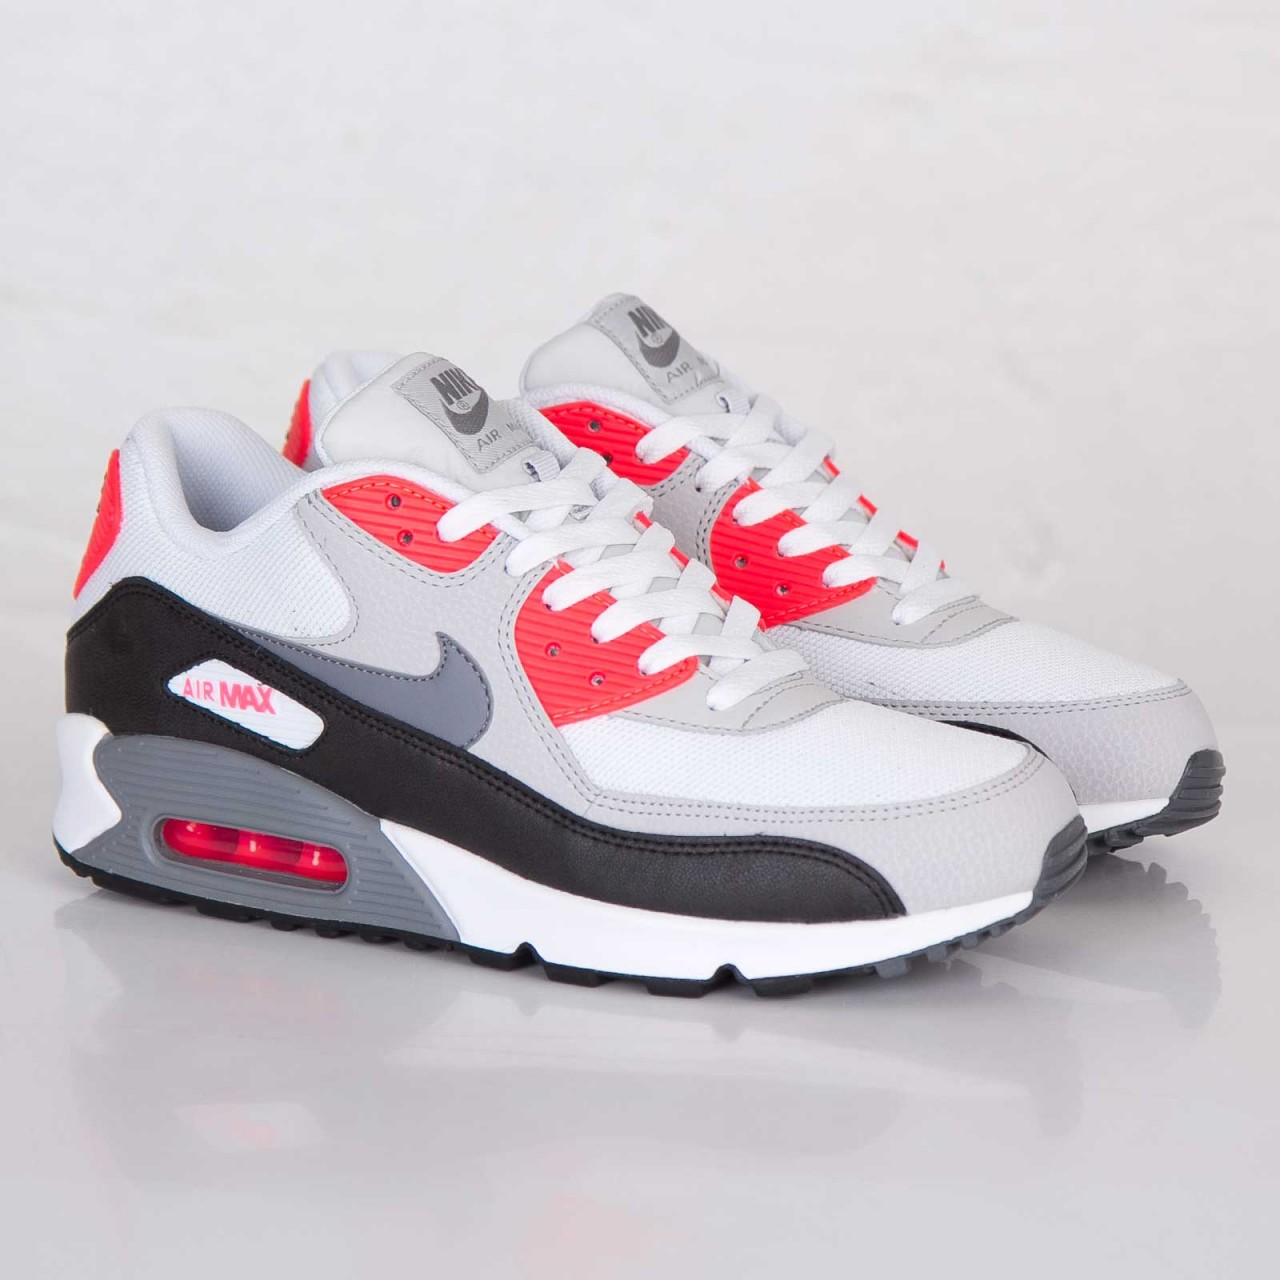 Nike Air Max 90 Essential white grey black red 1